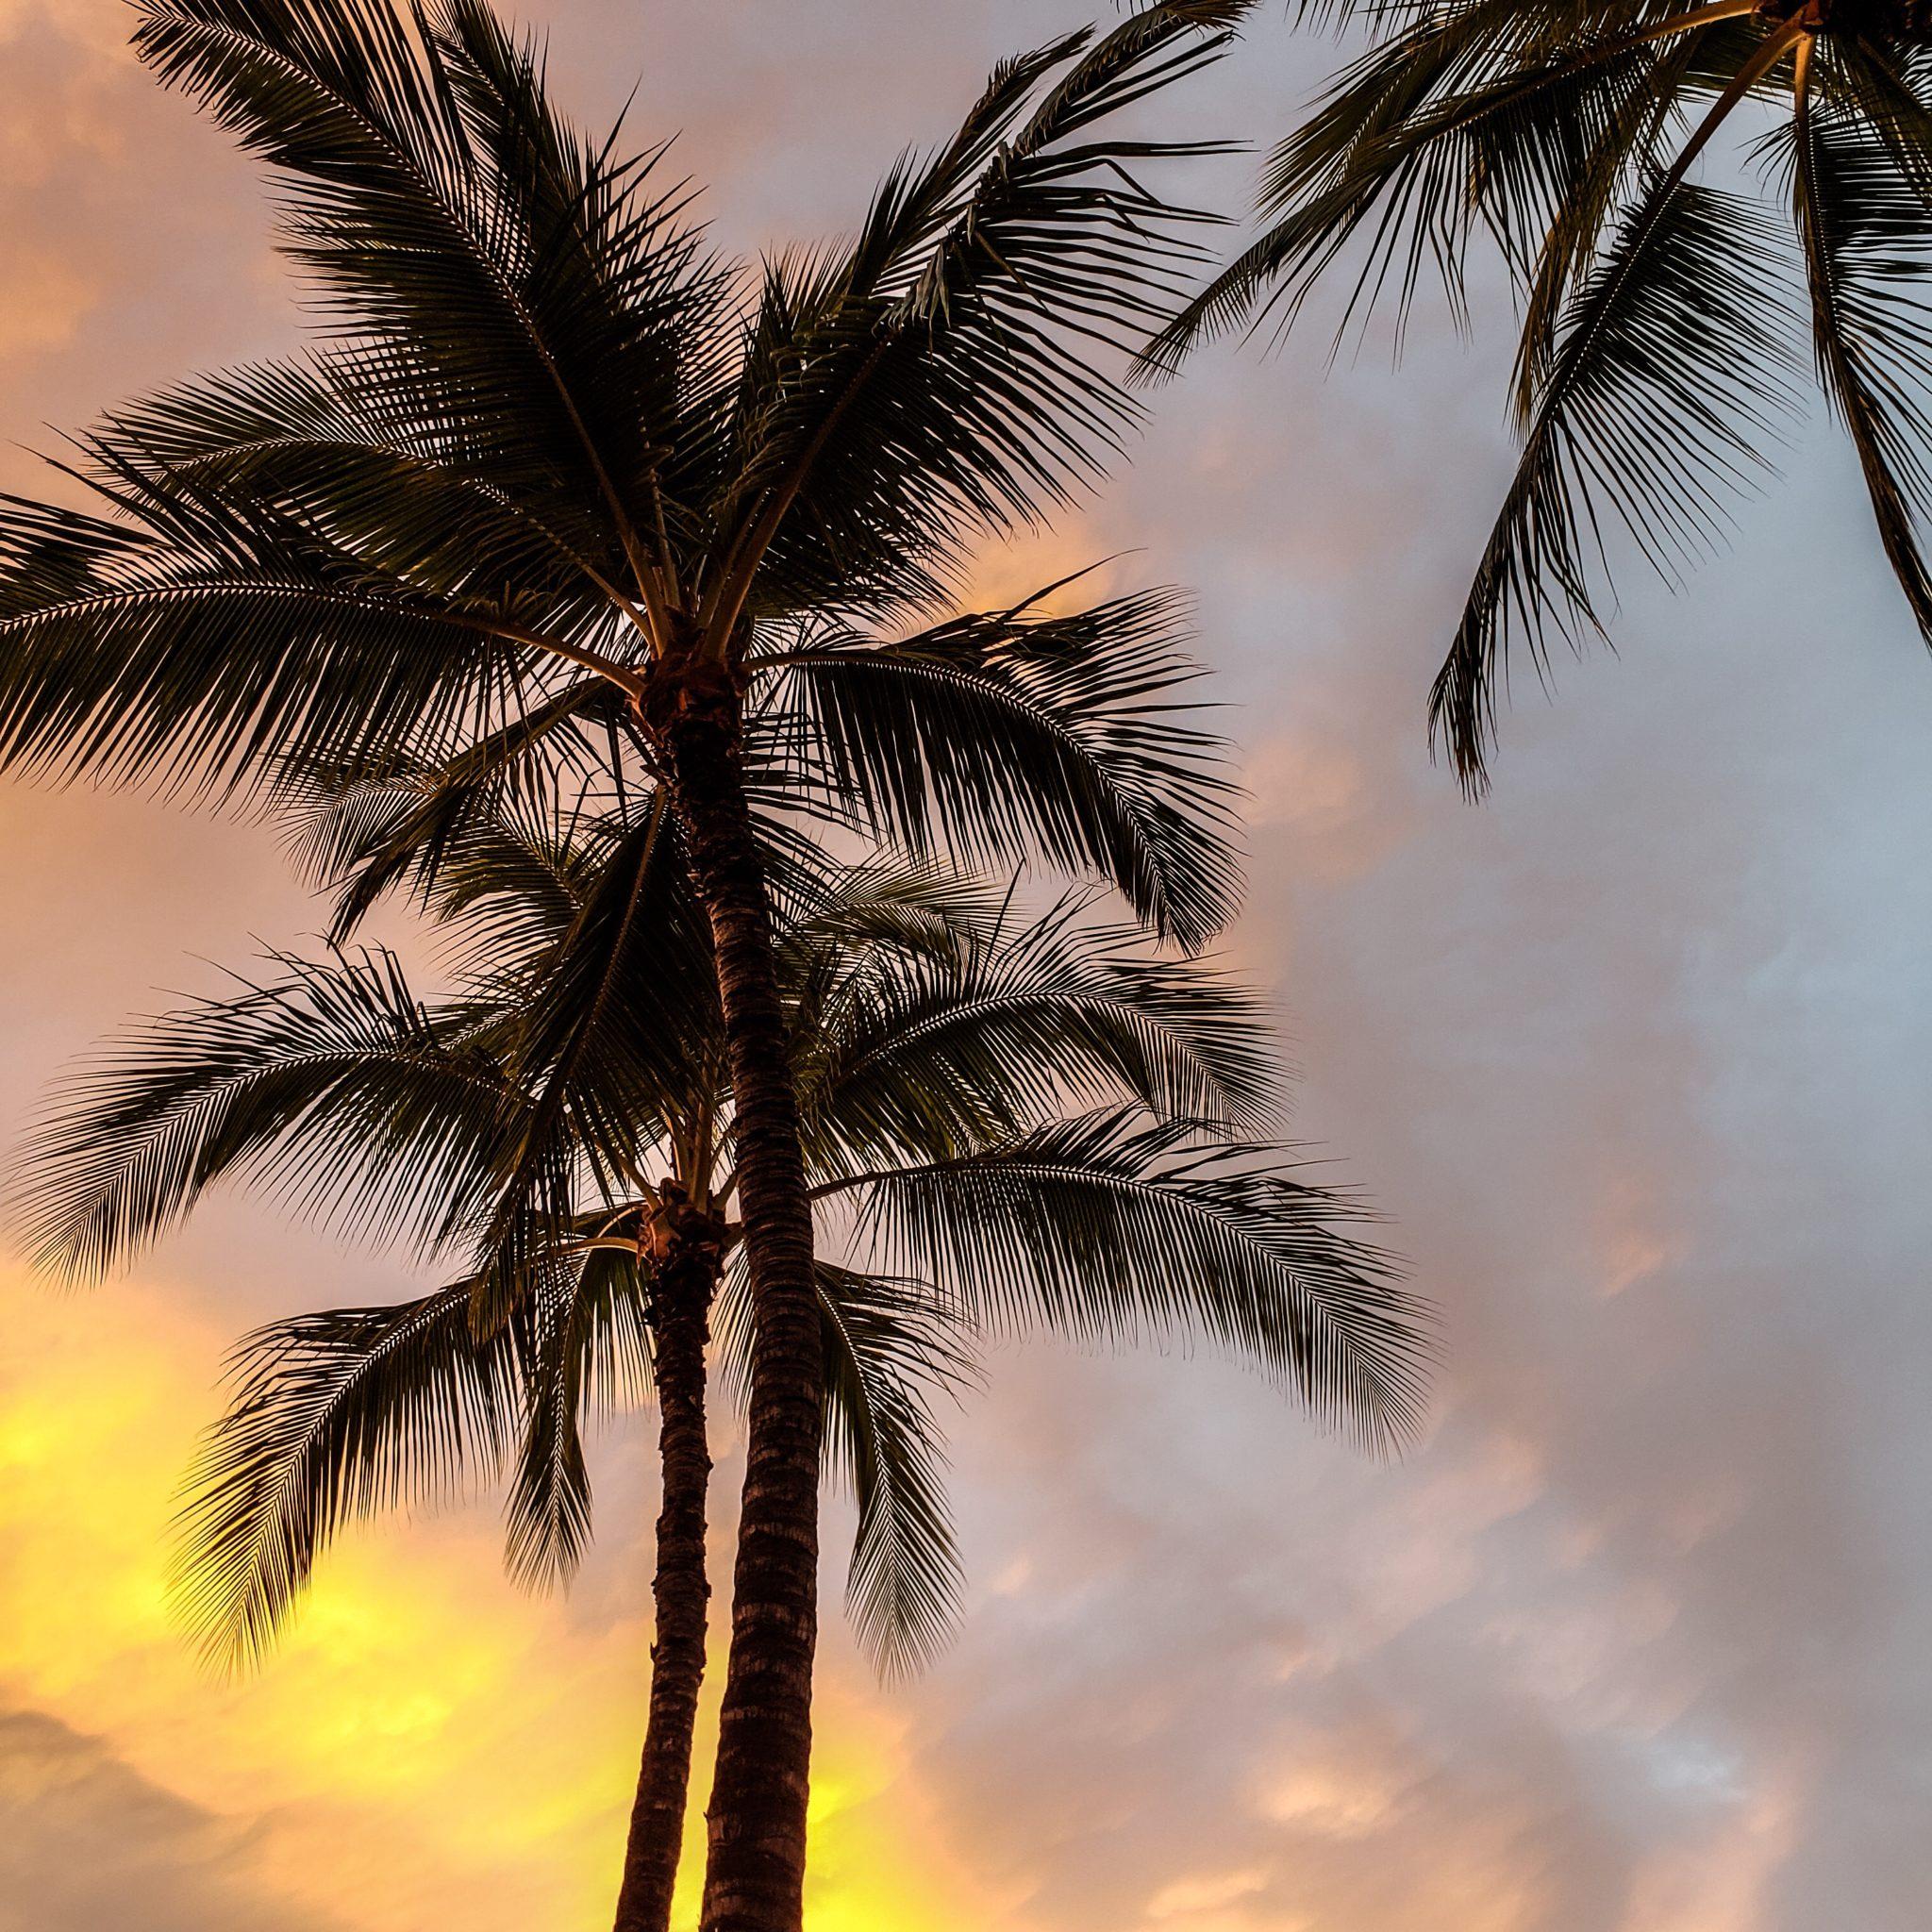 Beach - Hawaii - Oahu - Honolulu - Waikiki